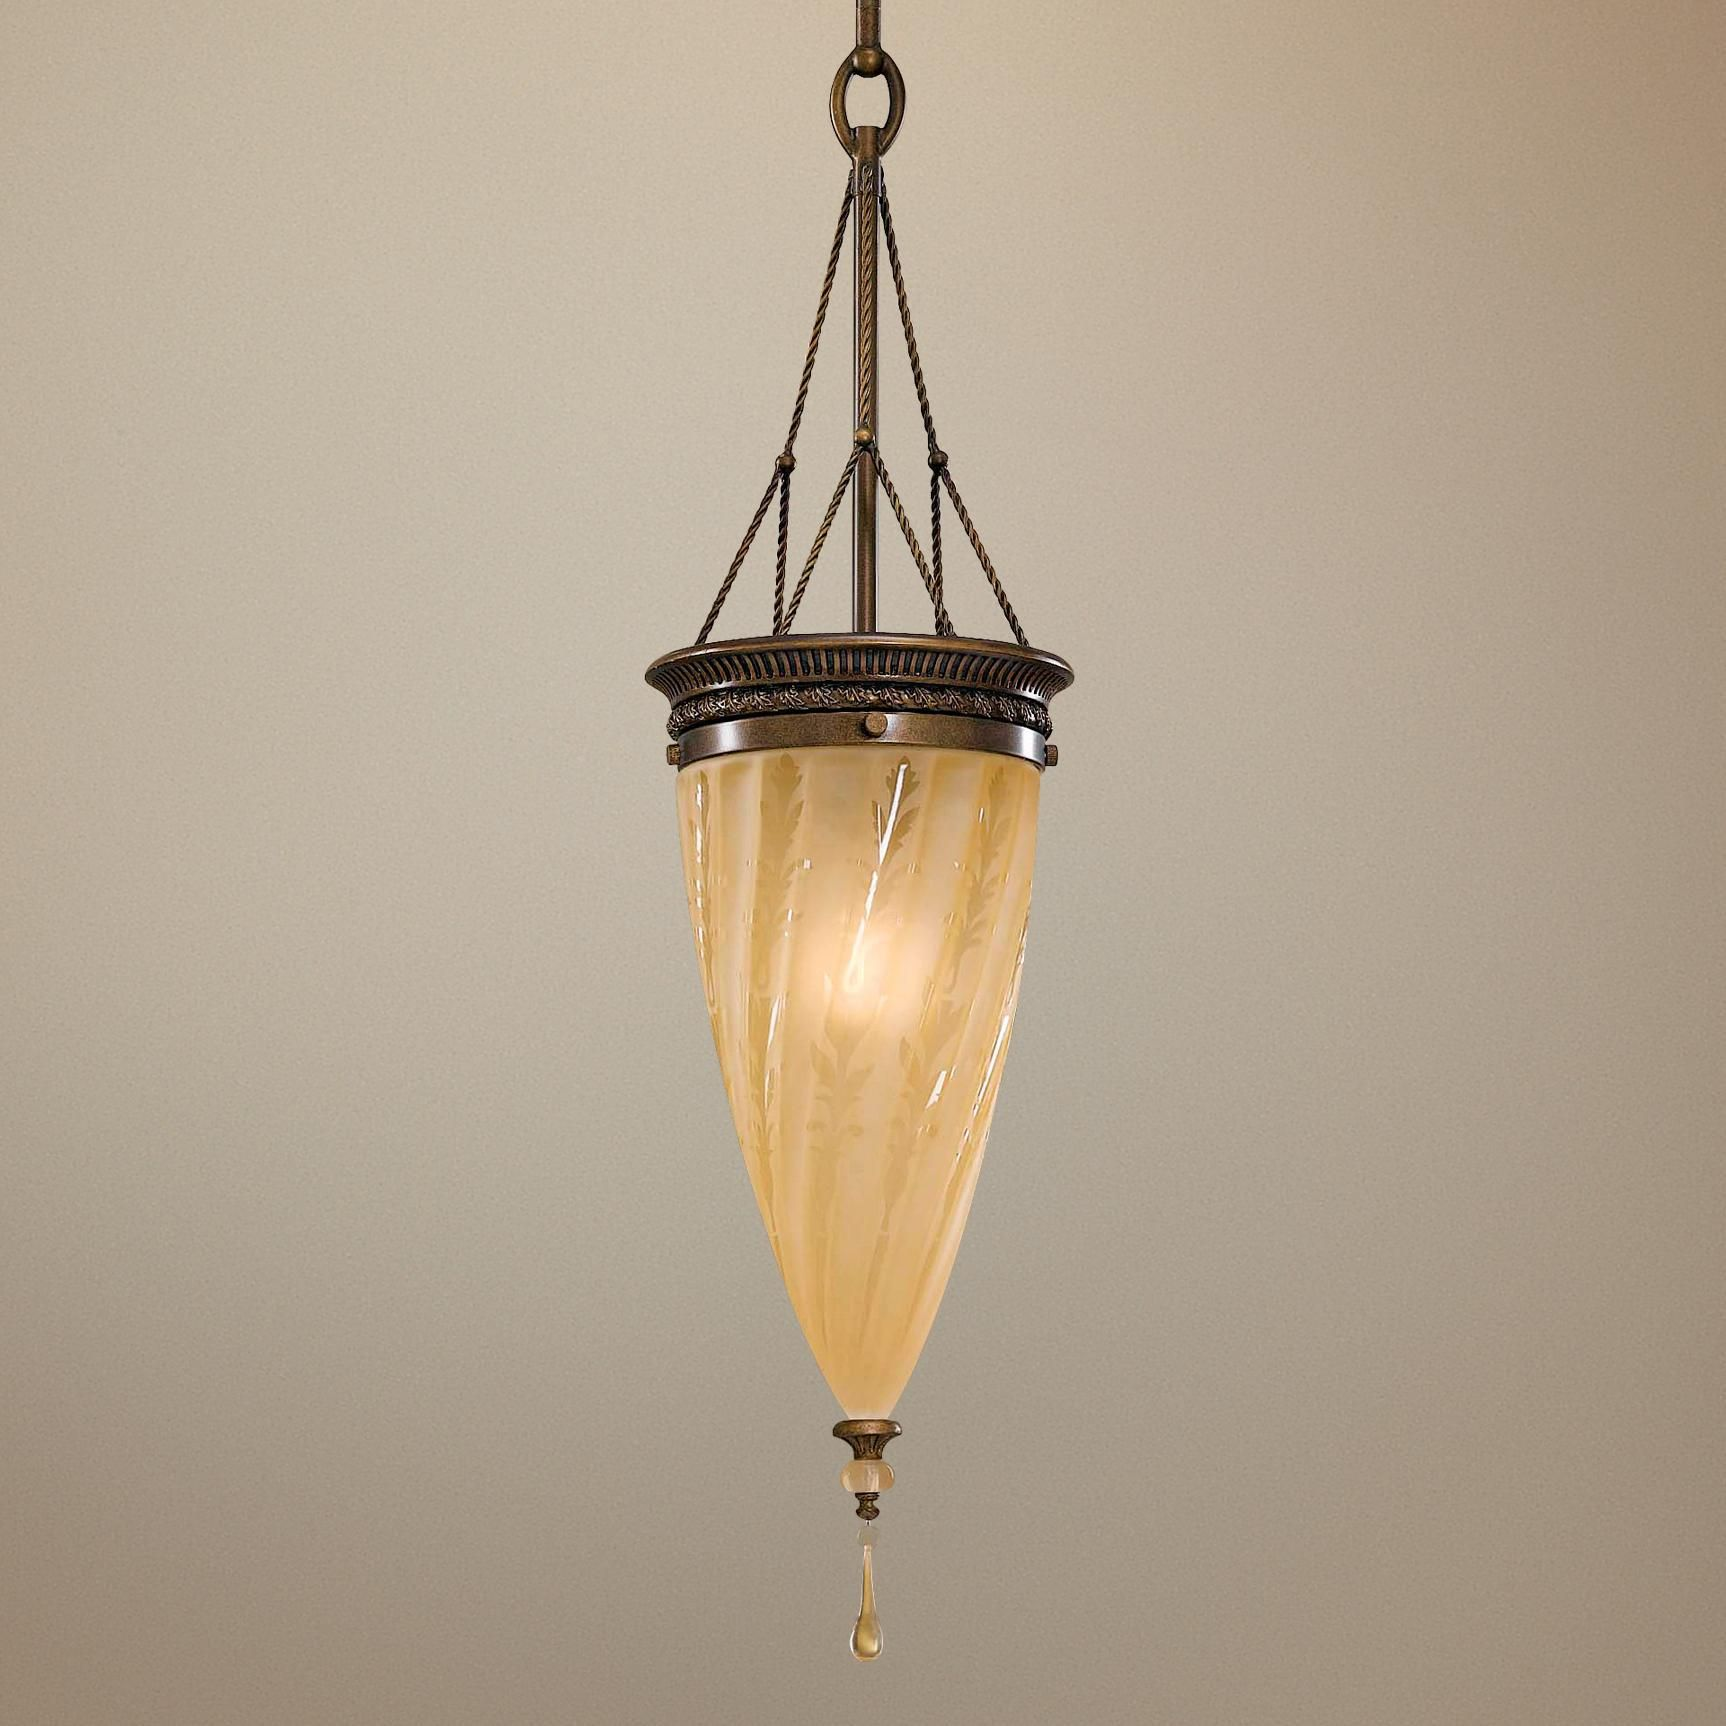 Murray Feiss Trinity Single Light Pendant Chandelier